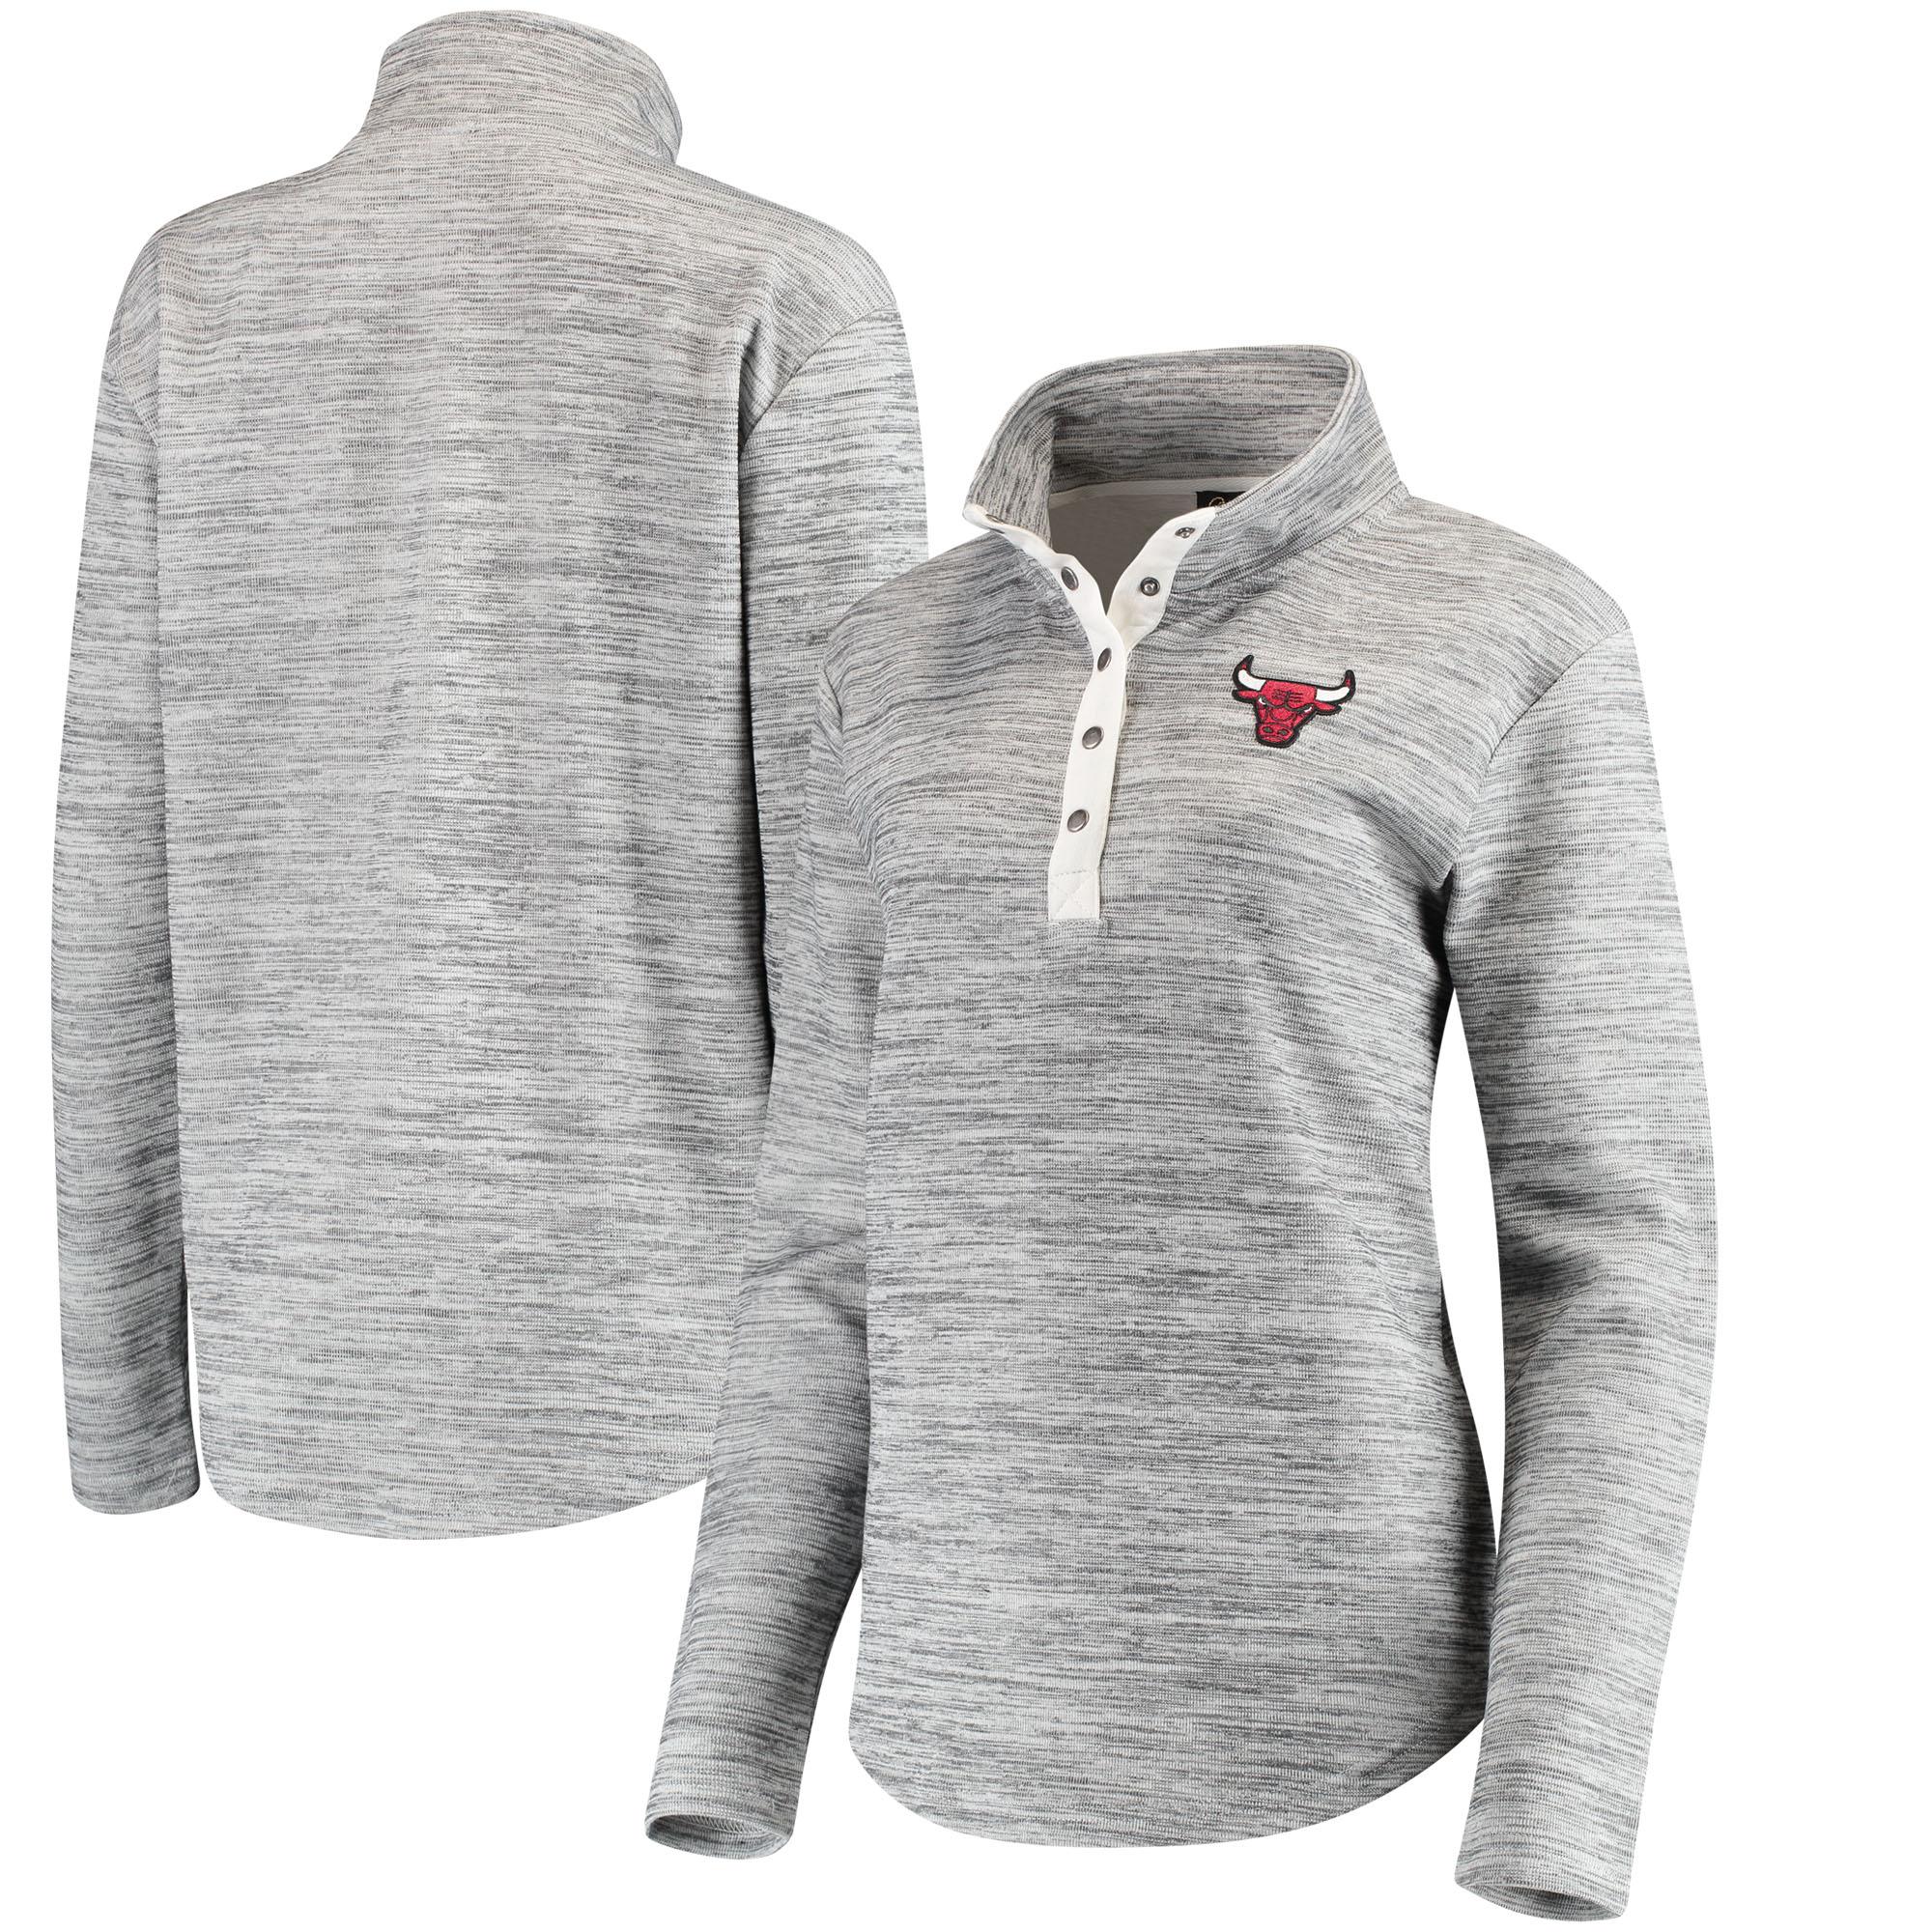 Chicago Bulls Women's Half-Snap Slub Pullover Sweatshirt - Heathered Gray